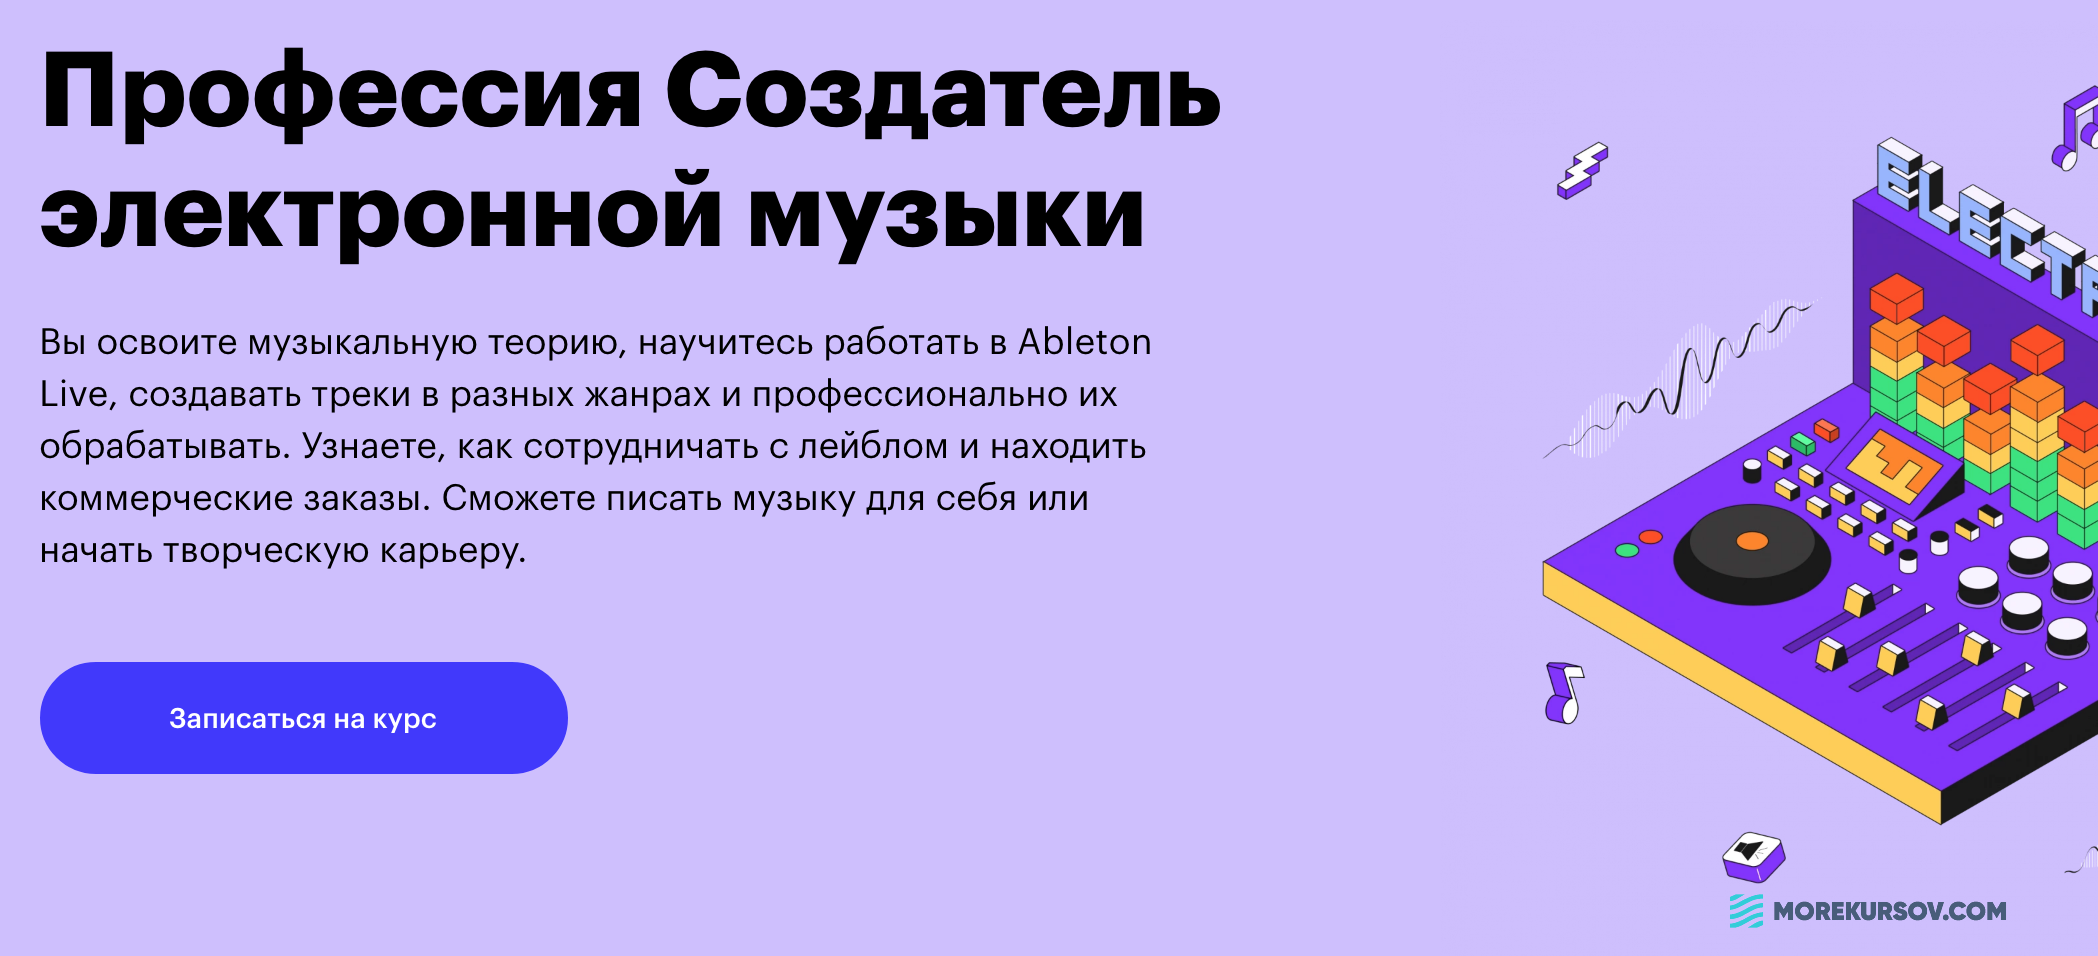 snimok-ehkrana-2020-09-13-v-11-30-28-png.9628